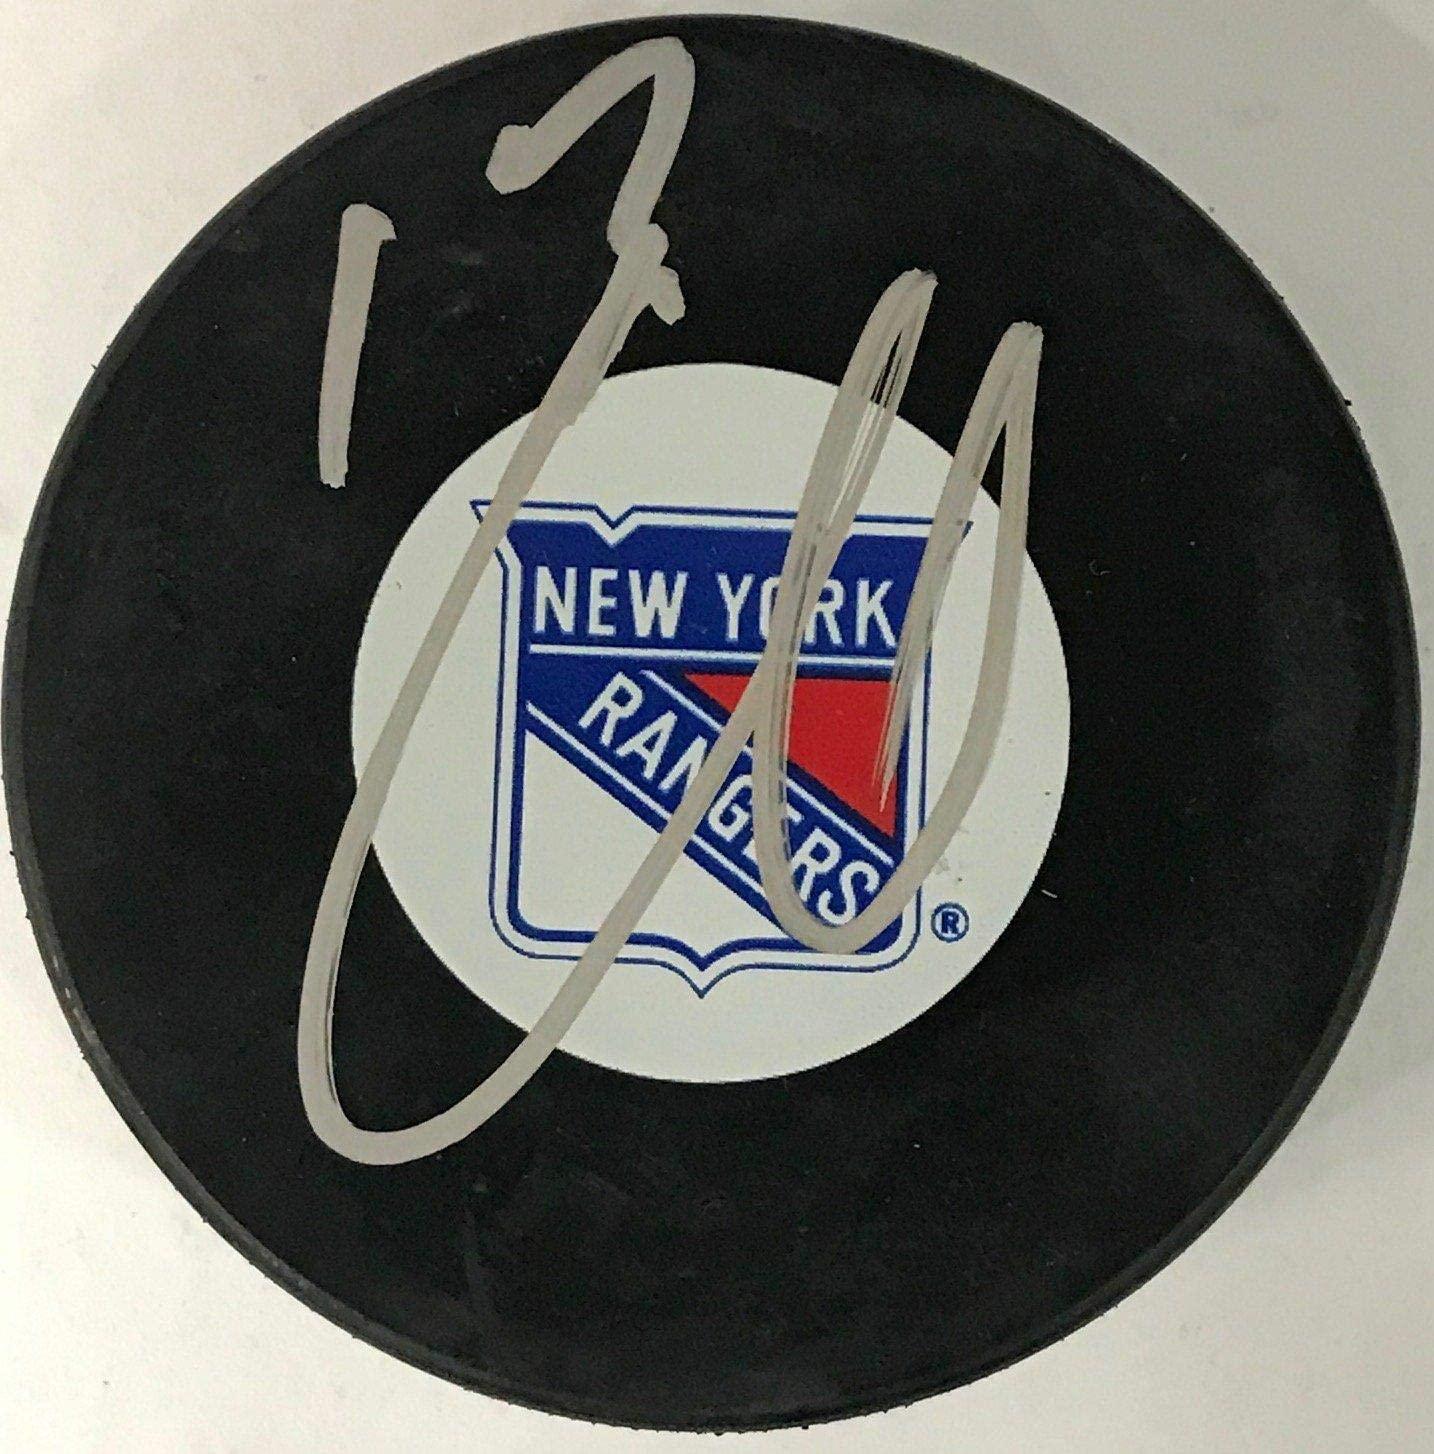 Nikolai Zherdev Autographed Hockey Puck - Autographed NHL Pucks